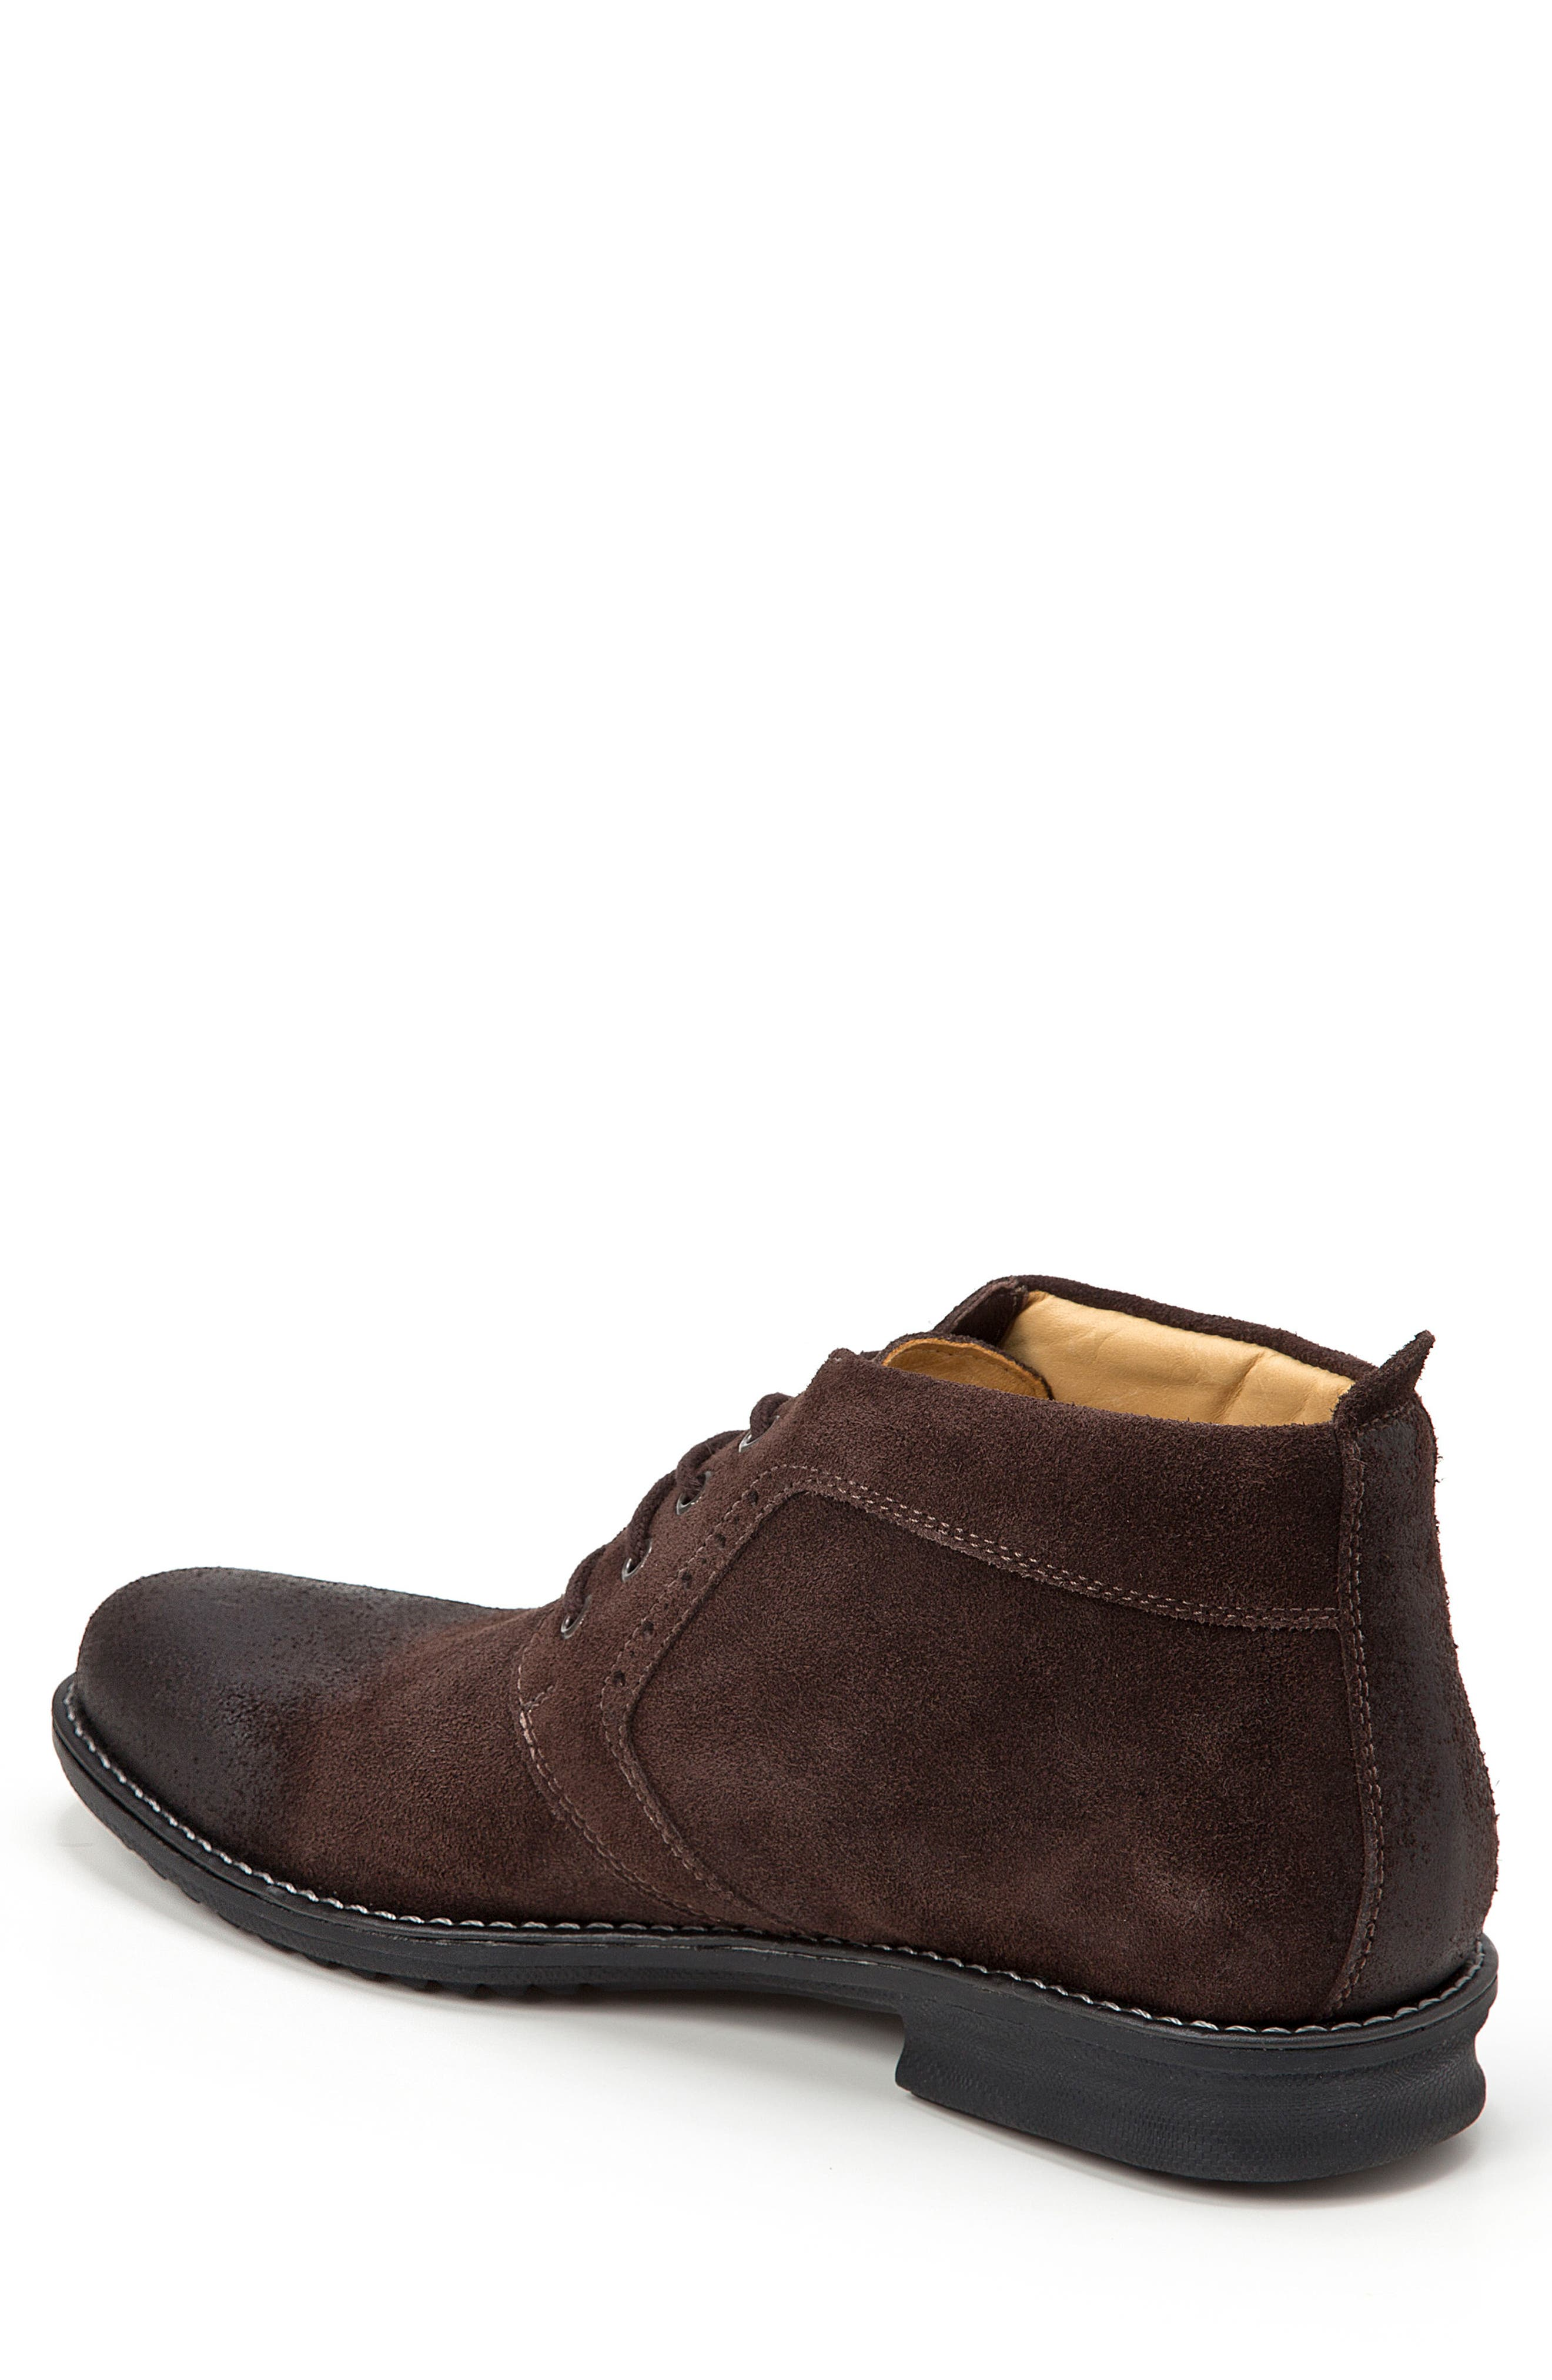 Chukka Boot,                             Alternate thumbnail 2, color,                             Brown